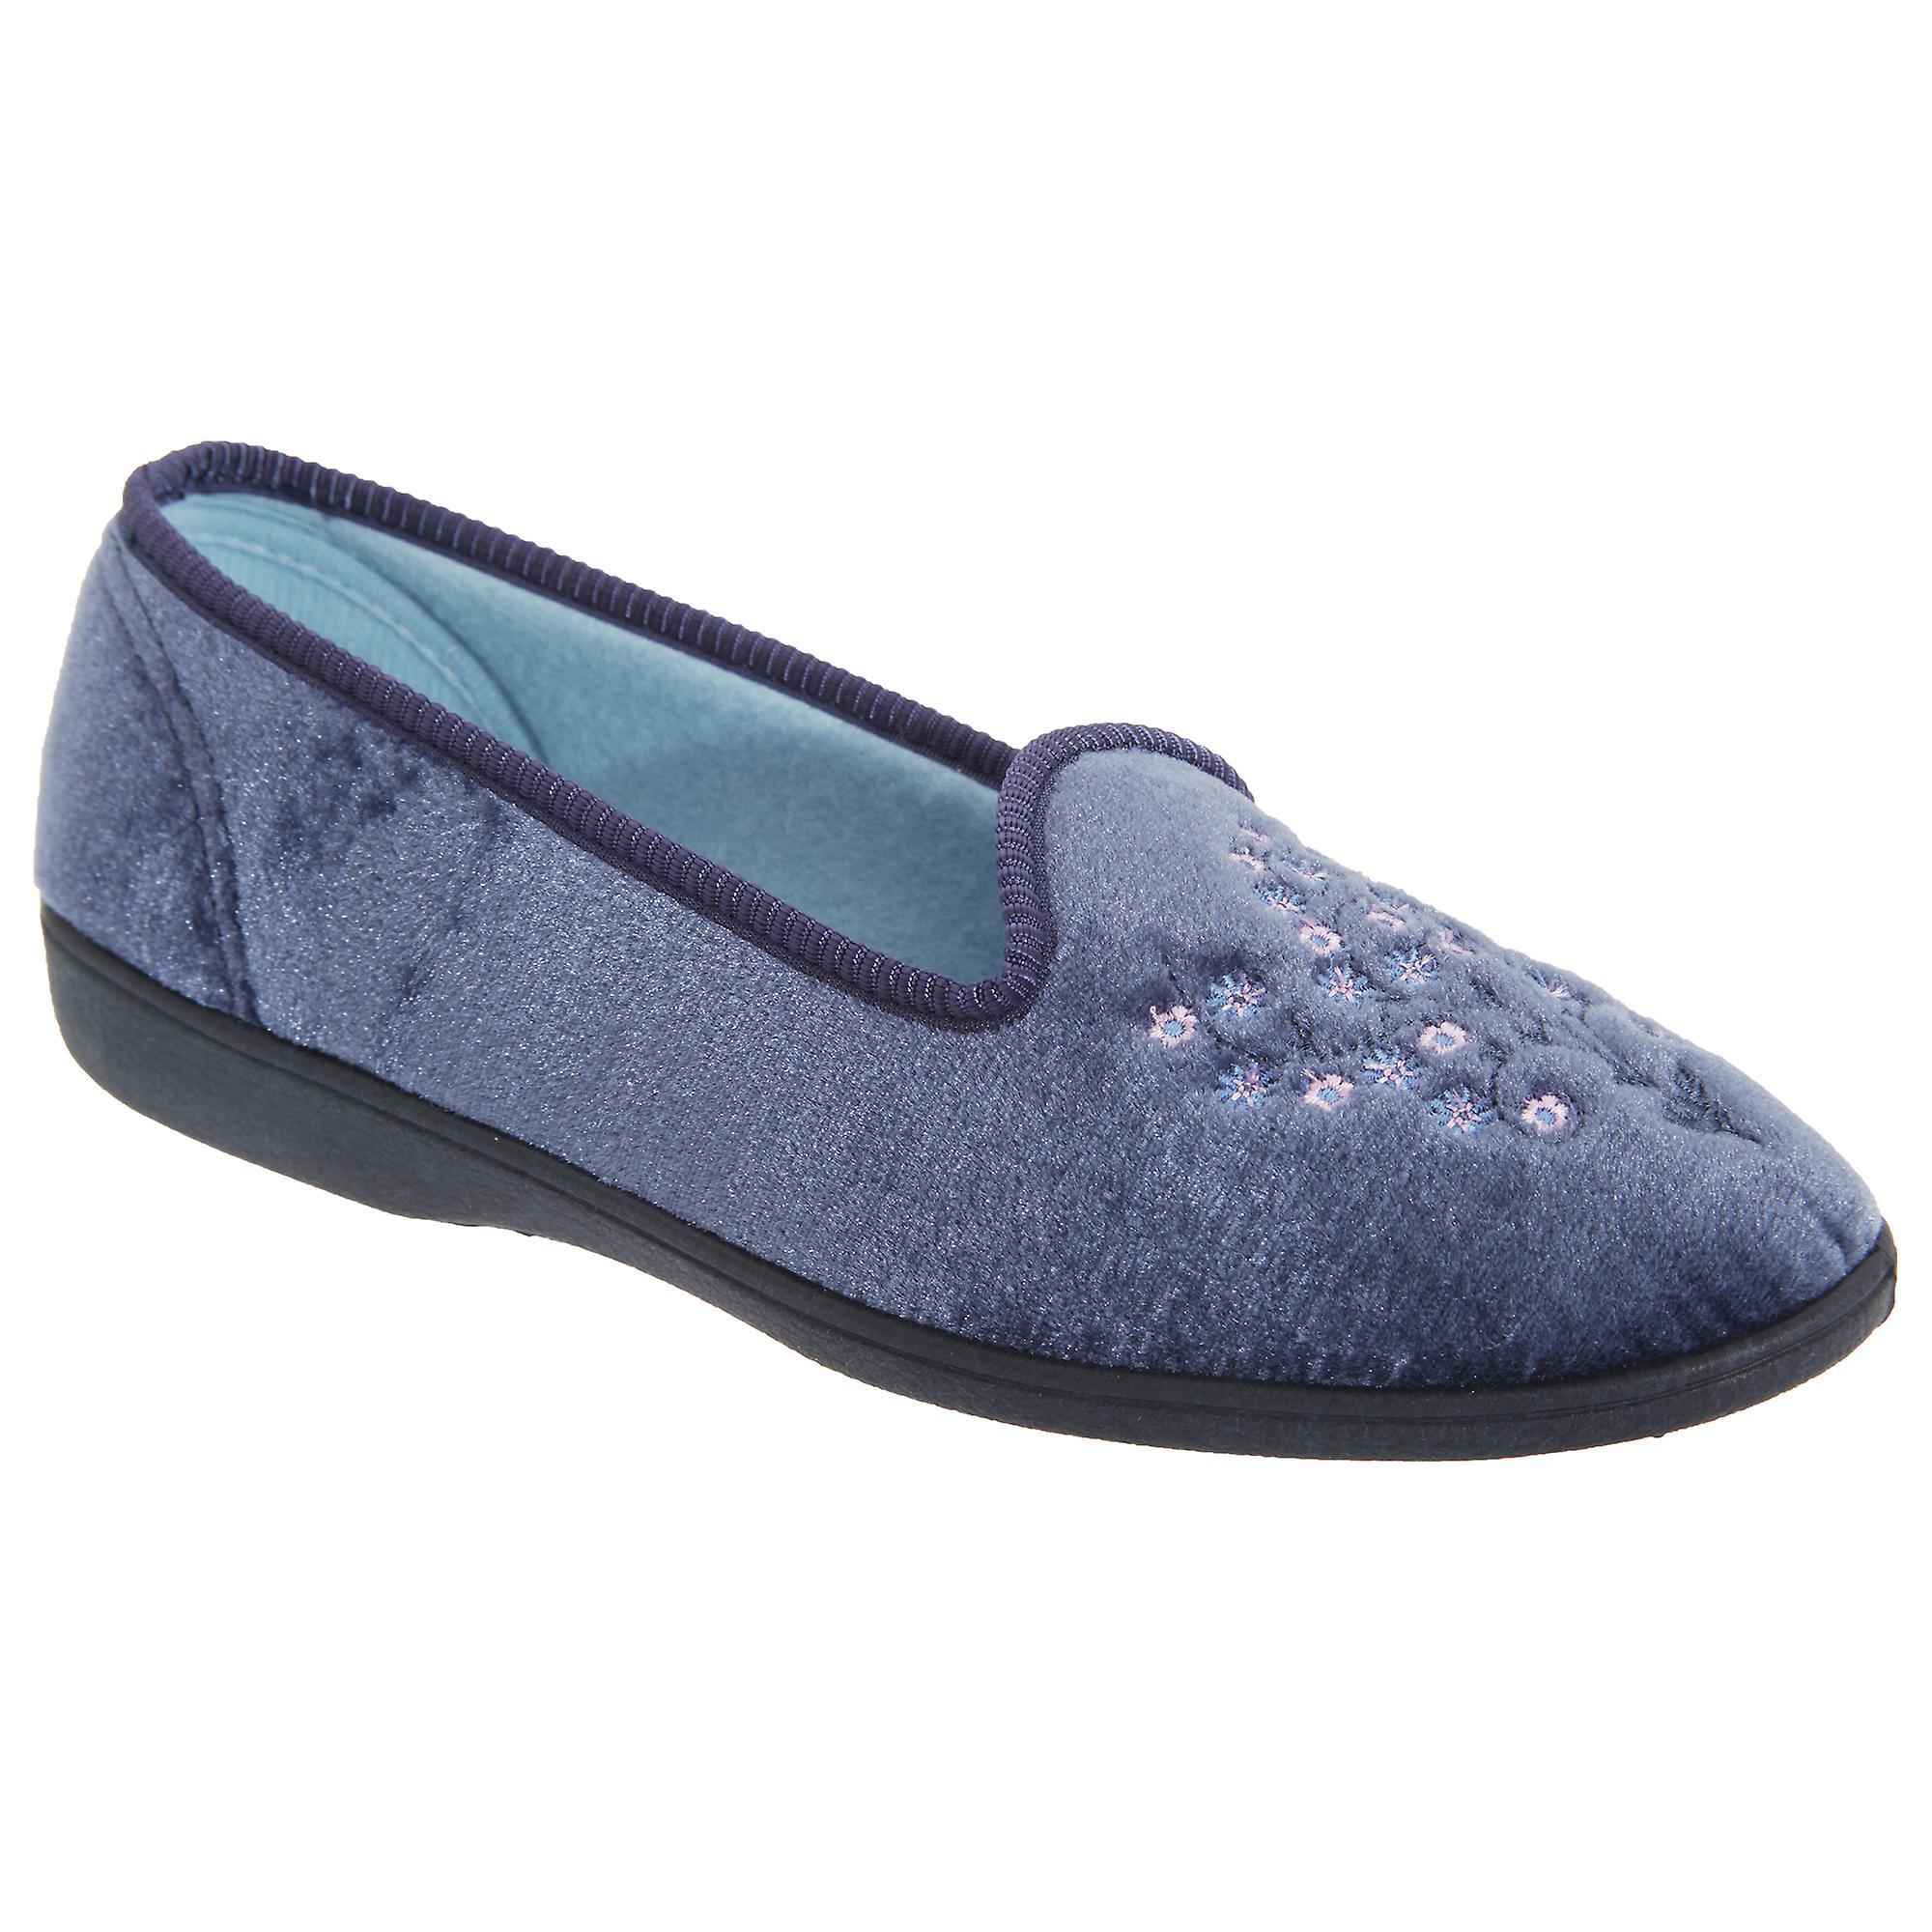 Womens Nieta Plain Sleepers Embroidered Slippers Ladies aOdwEWwq